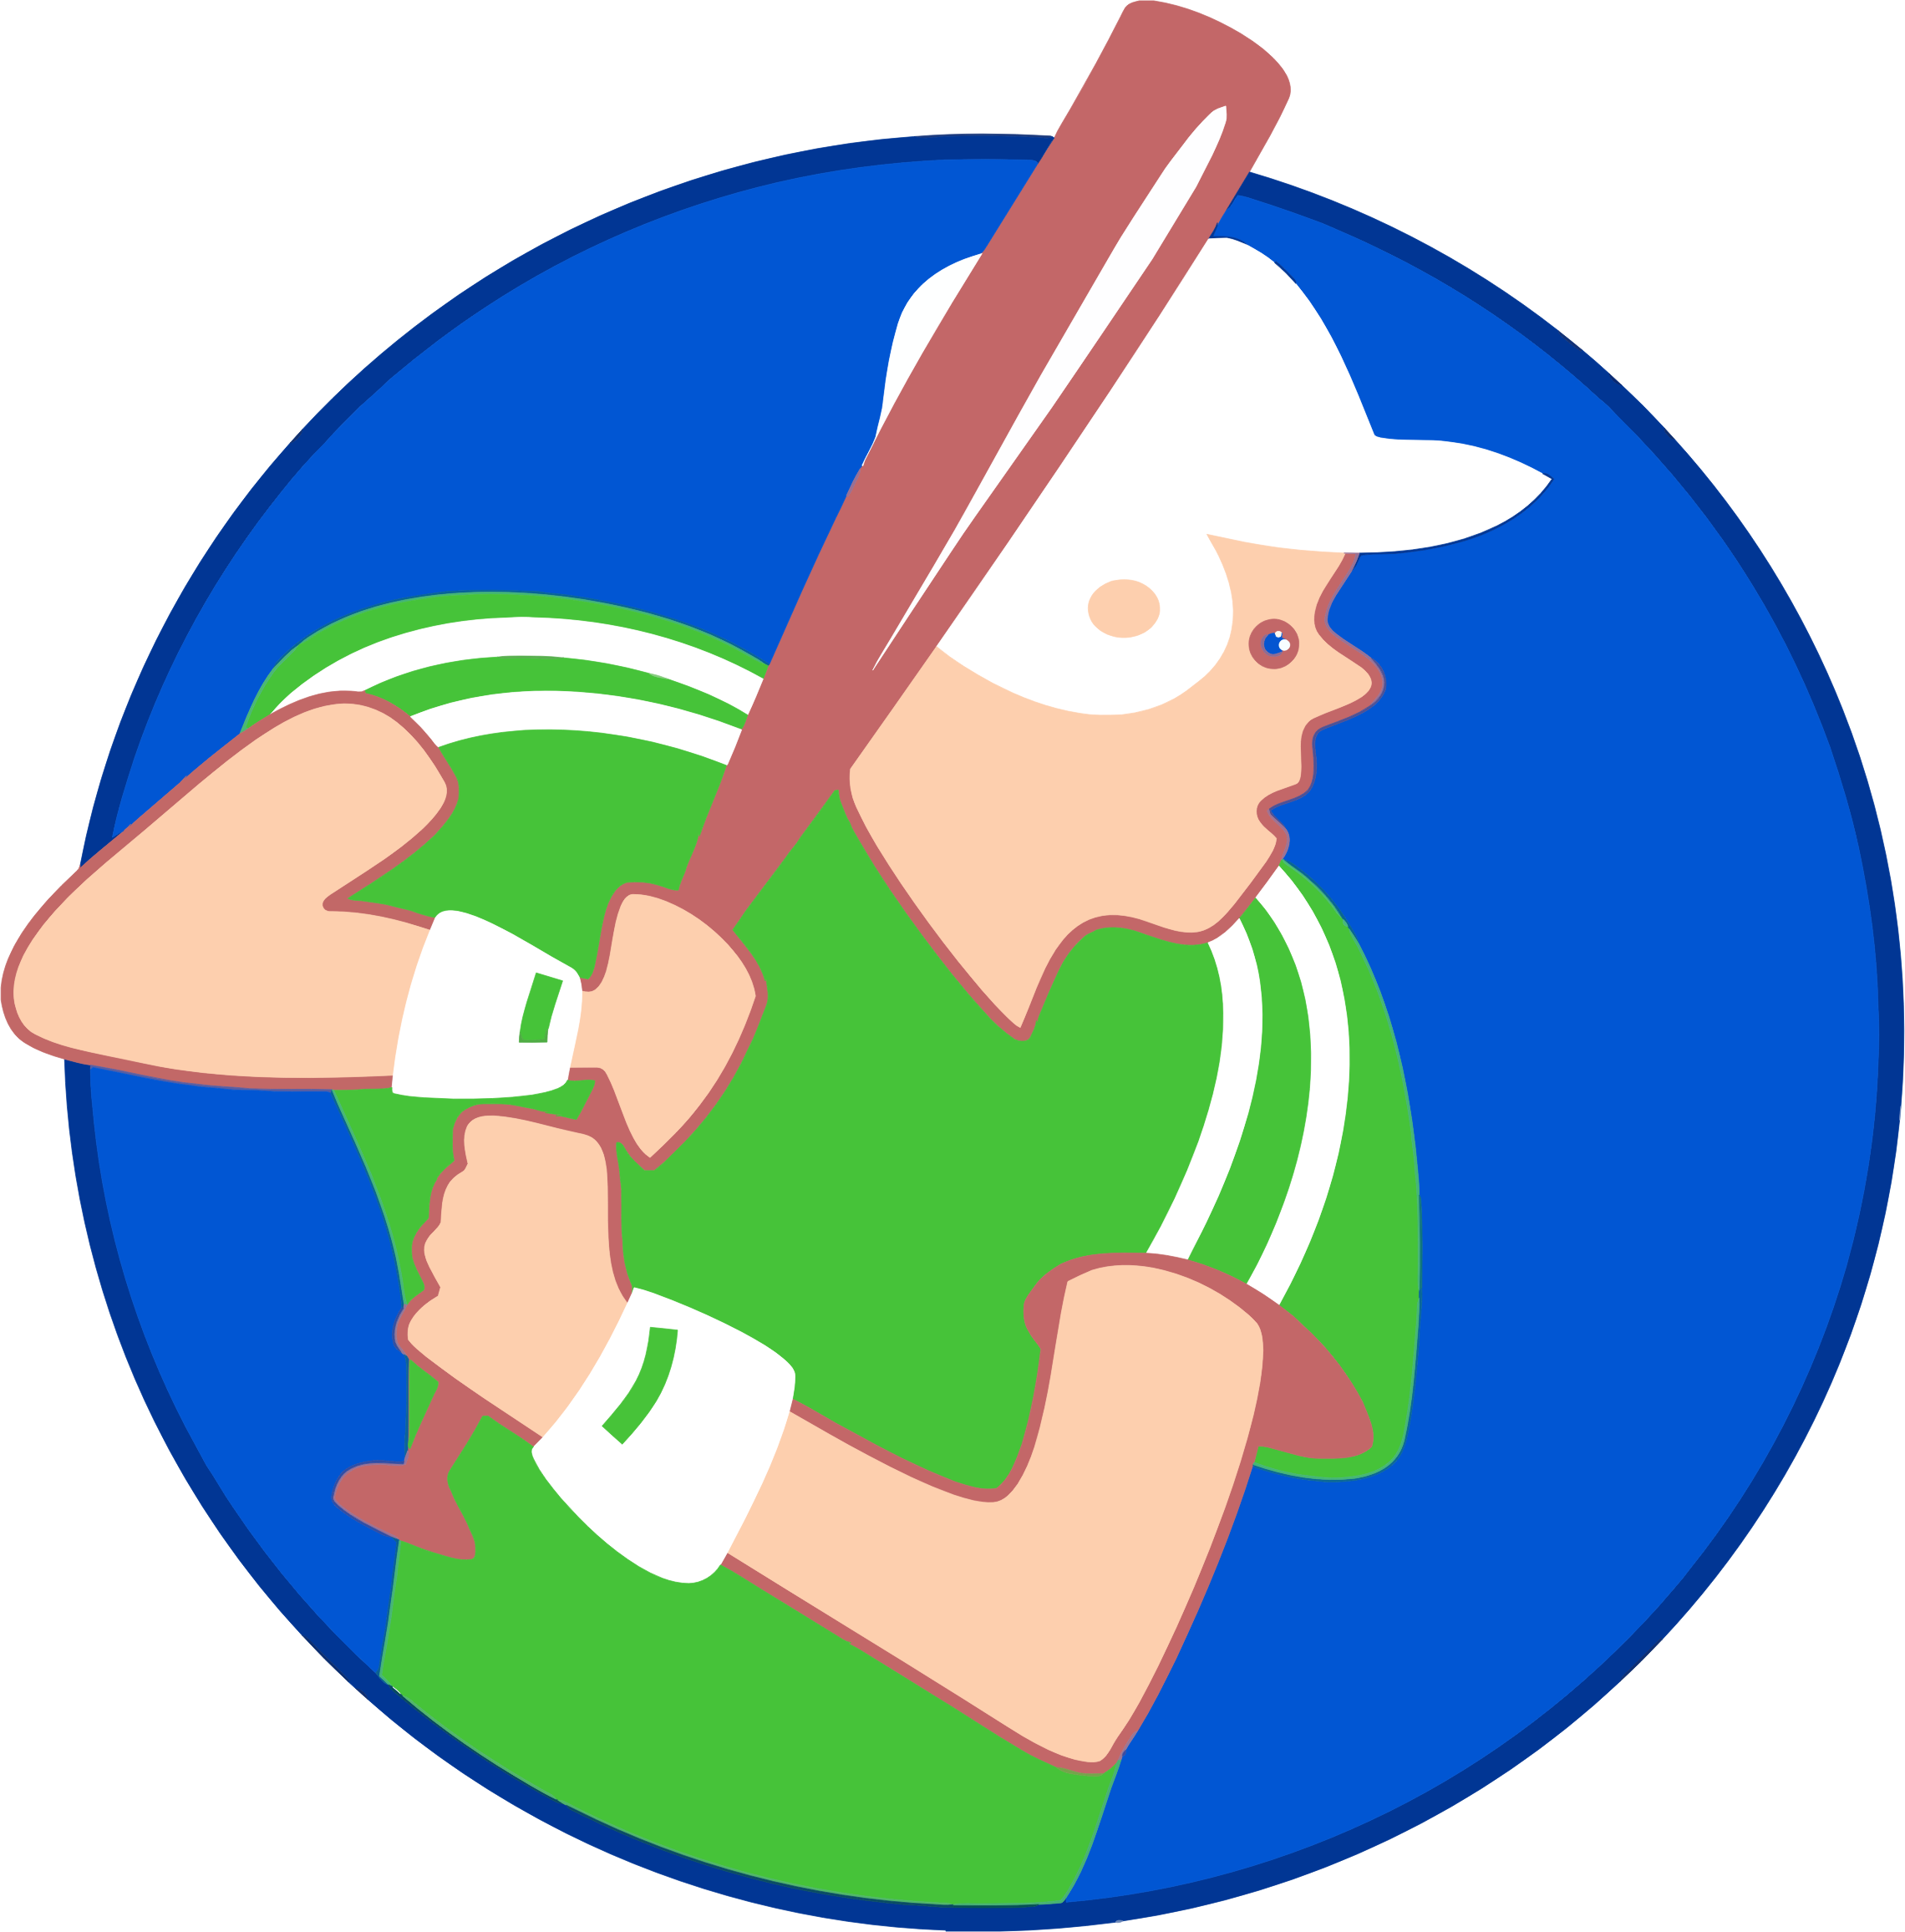 Clipart boy baseball banner transparent stock Clipart - Baseball Boy Icon banner transparent stock